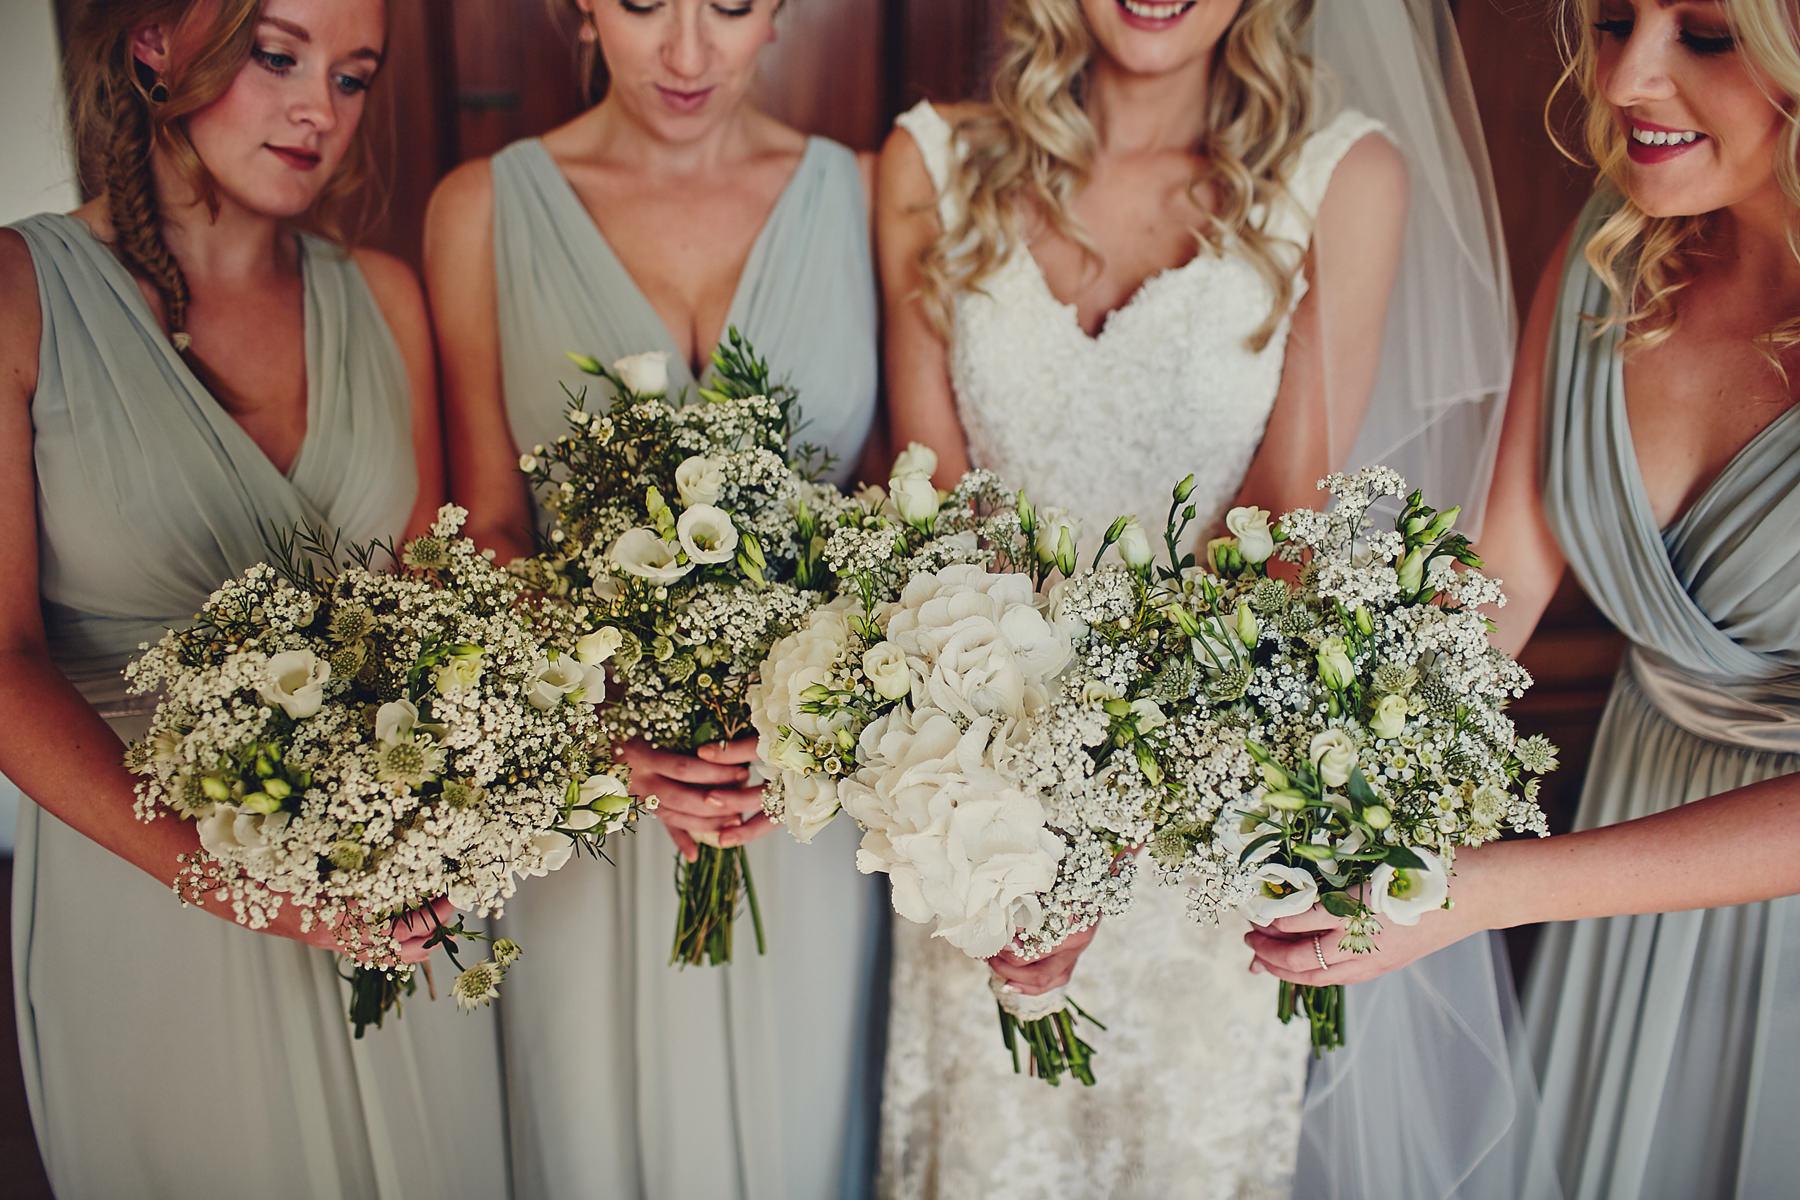 Wedding at Borris House co.Carlow 029 - Borris House wedding | Cara & David